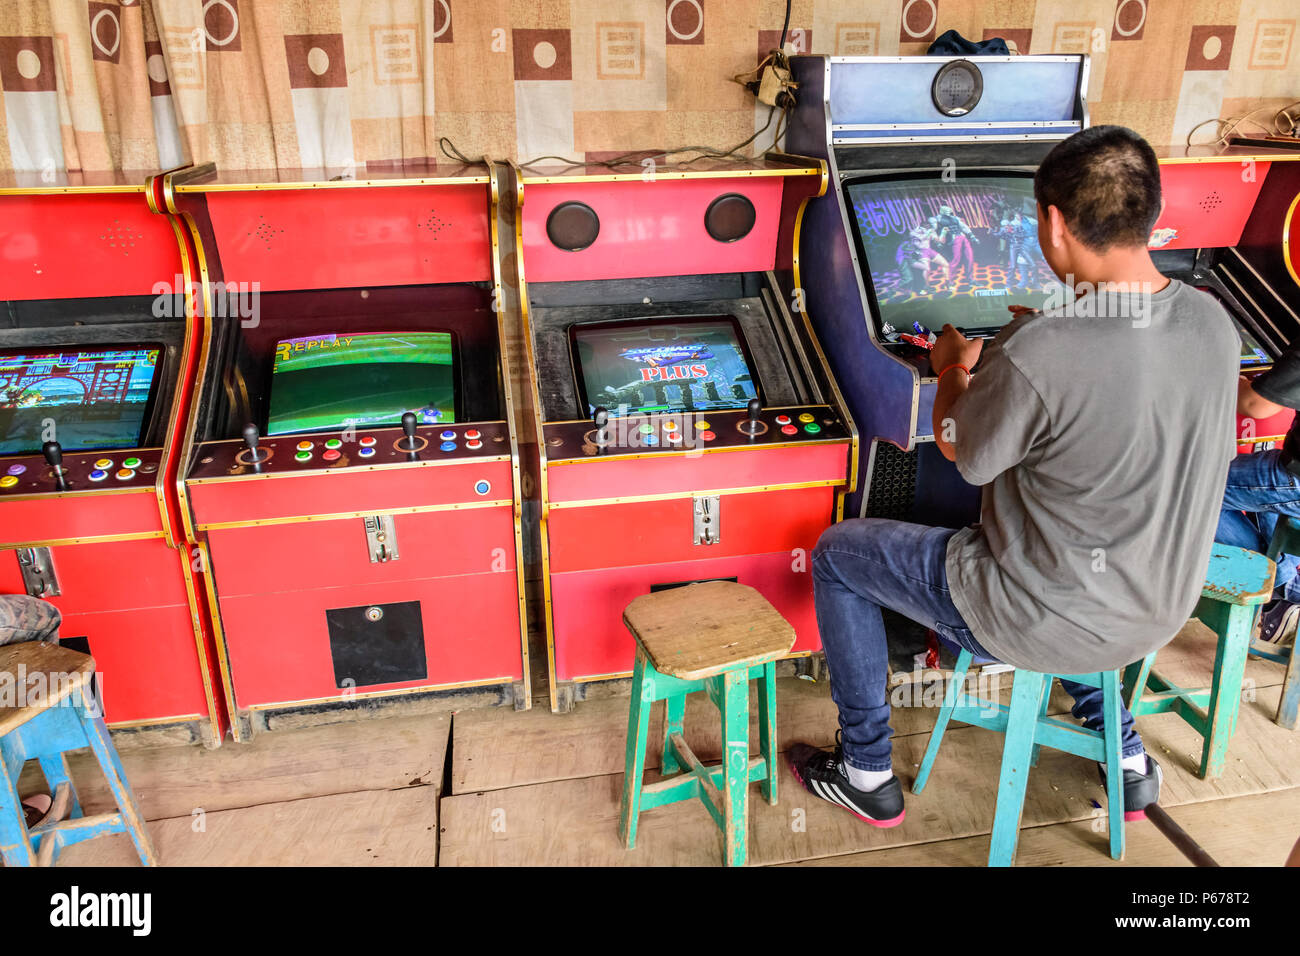 San Juan del Obispo, Guatemala - June 24, 2018: Local plays arcade games at village fair near UNESCO World Heritage Site of Antigua - Stock Image